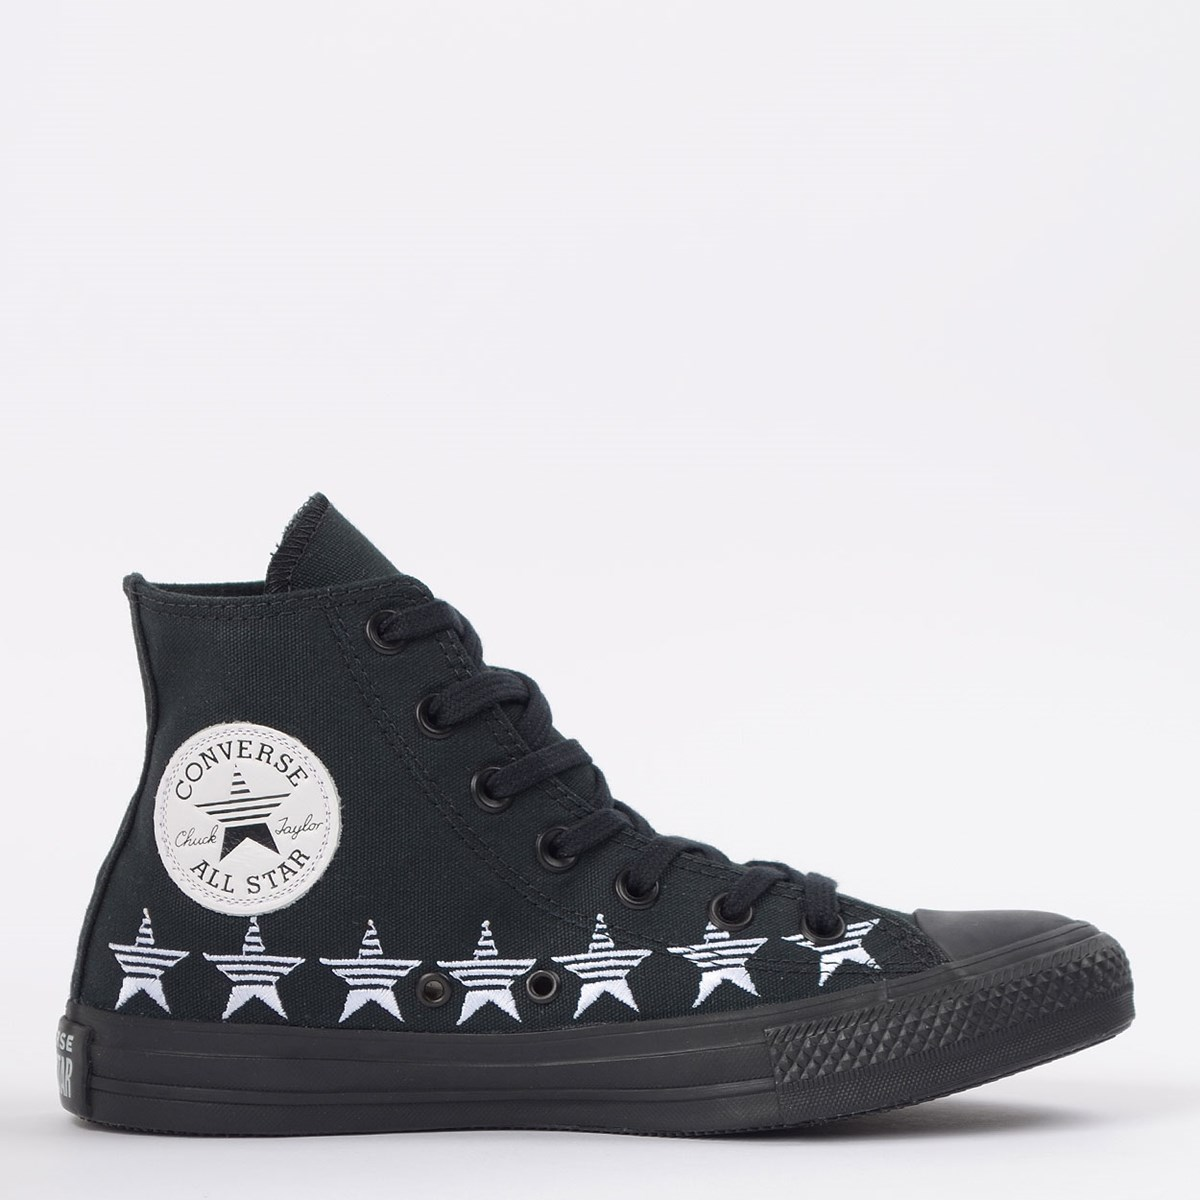 Tênis Converse Chuck Taylor All Star Hi Preto Branco CT14770001